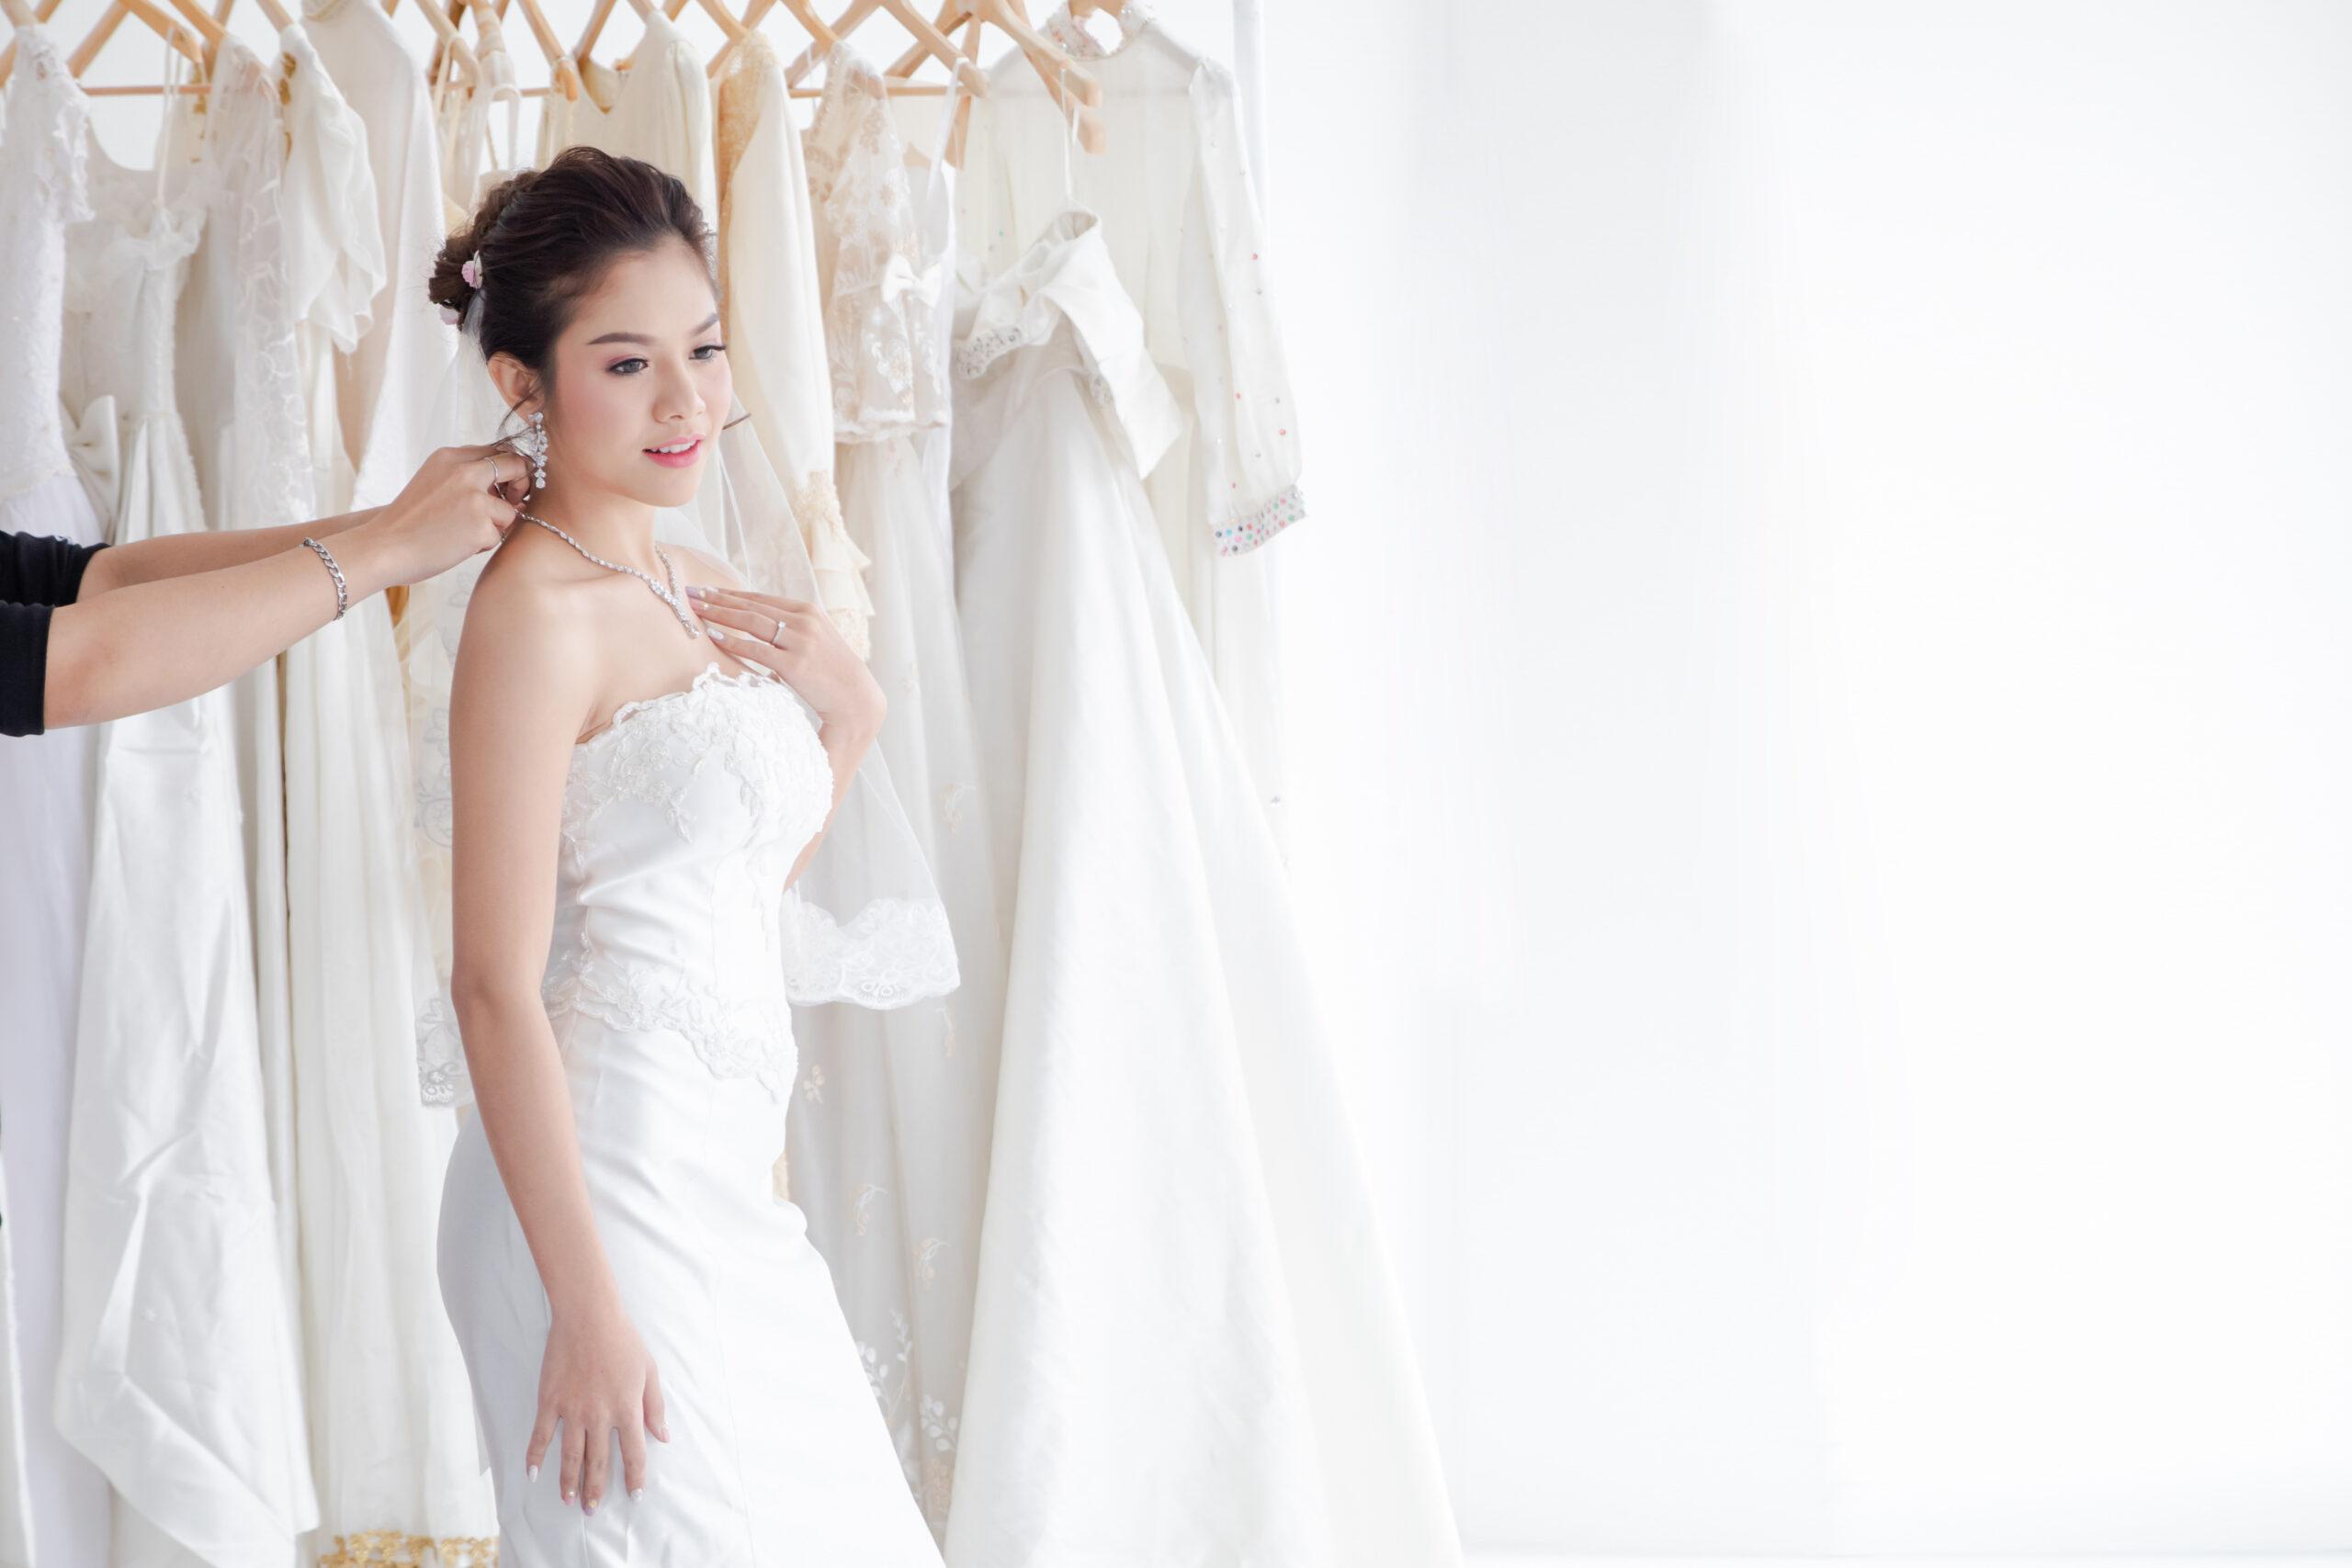 Bride tries on wedding dress